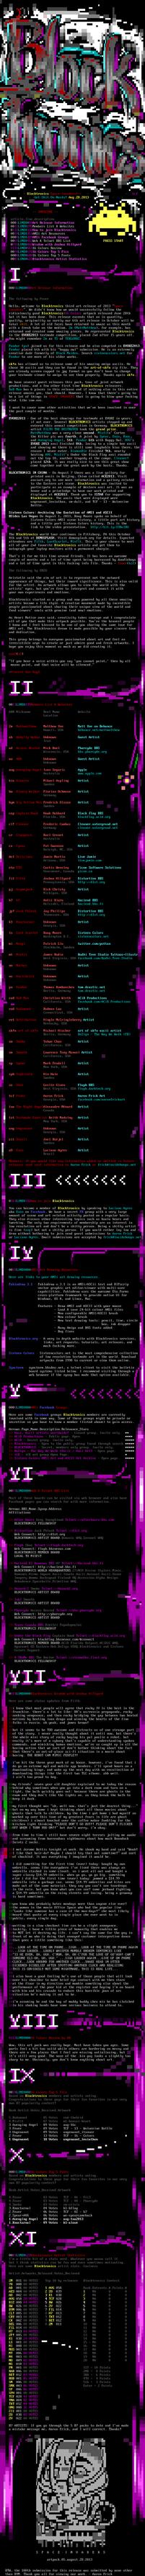 005 - B7 - Information by blocktronics